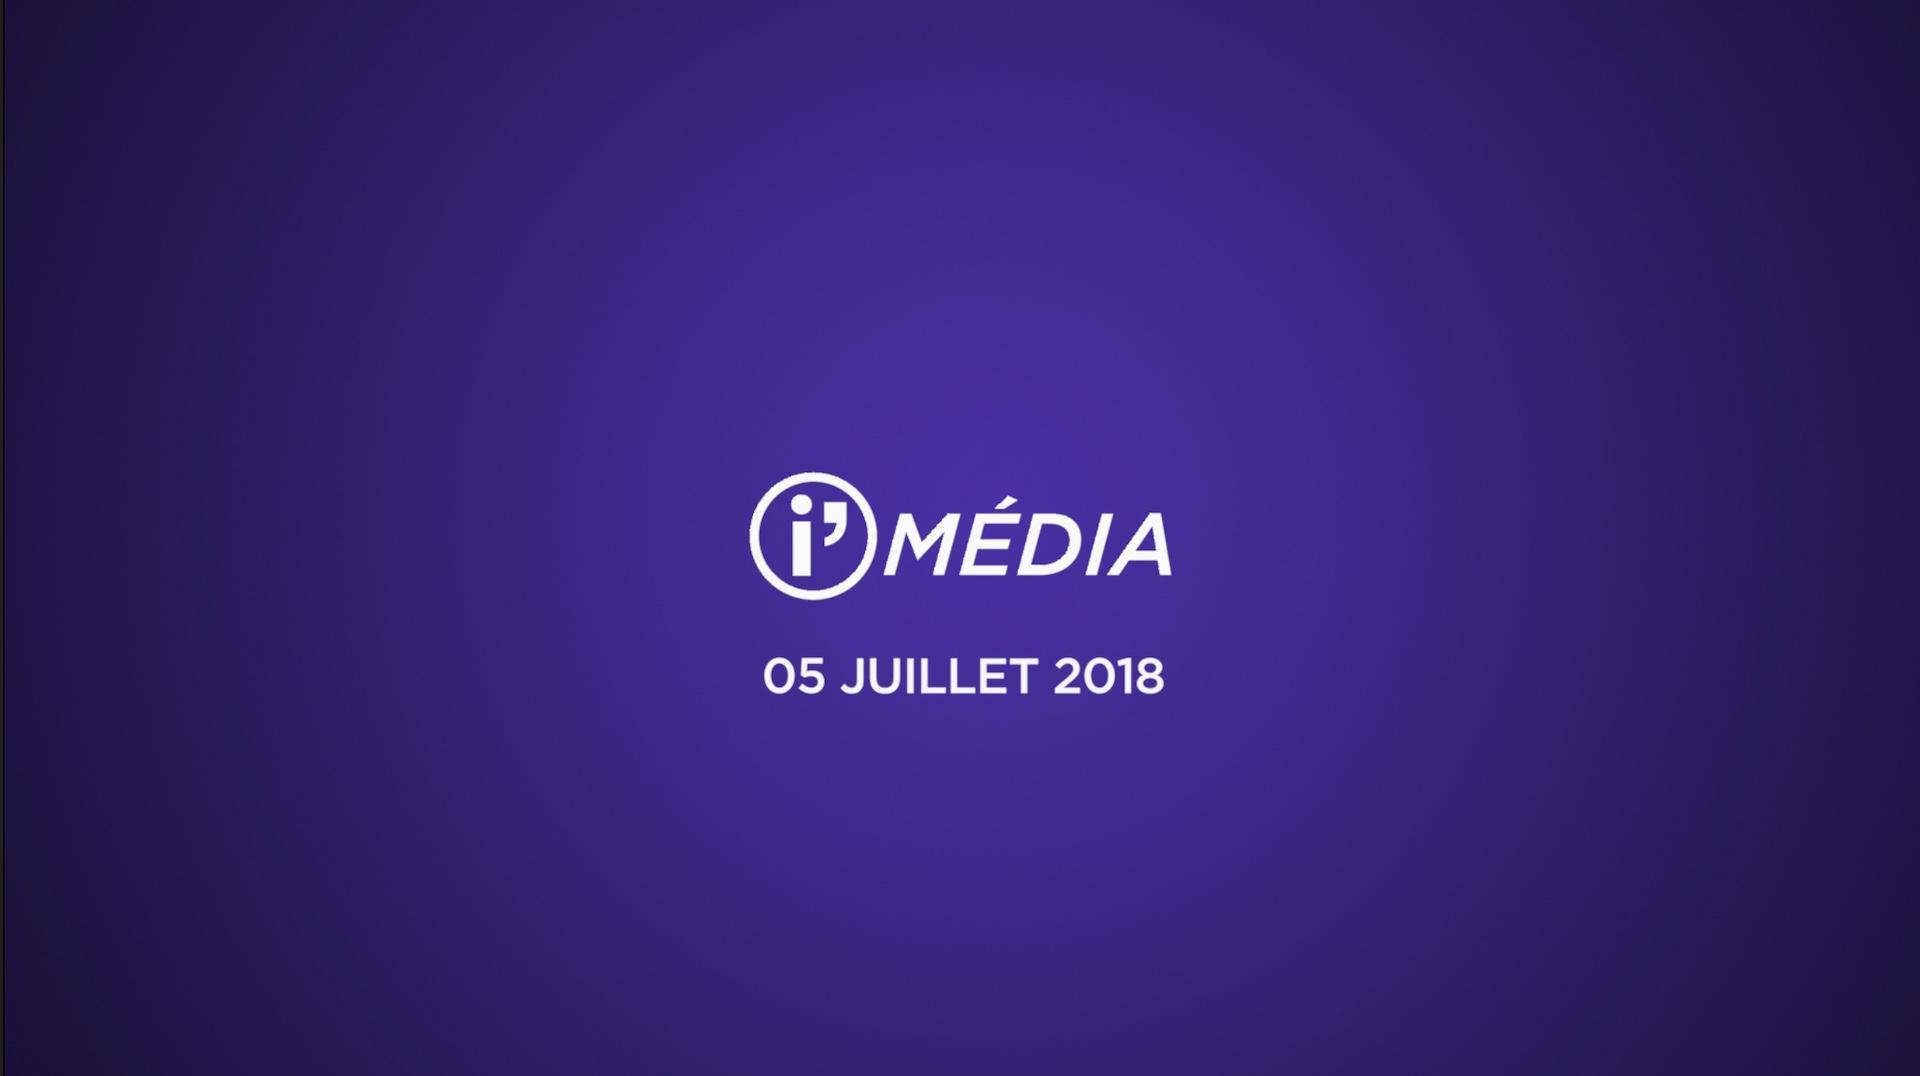 I'Média050718